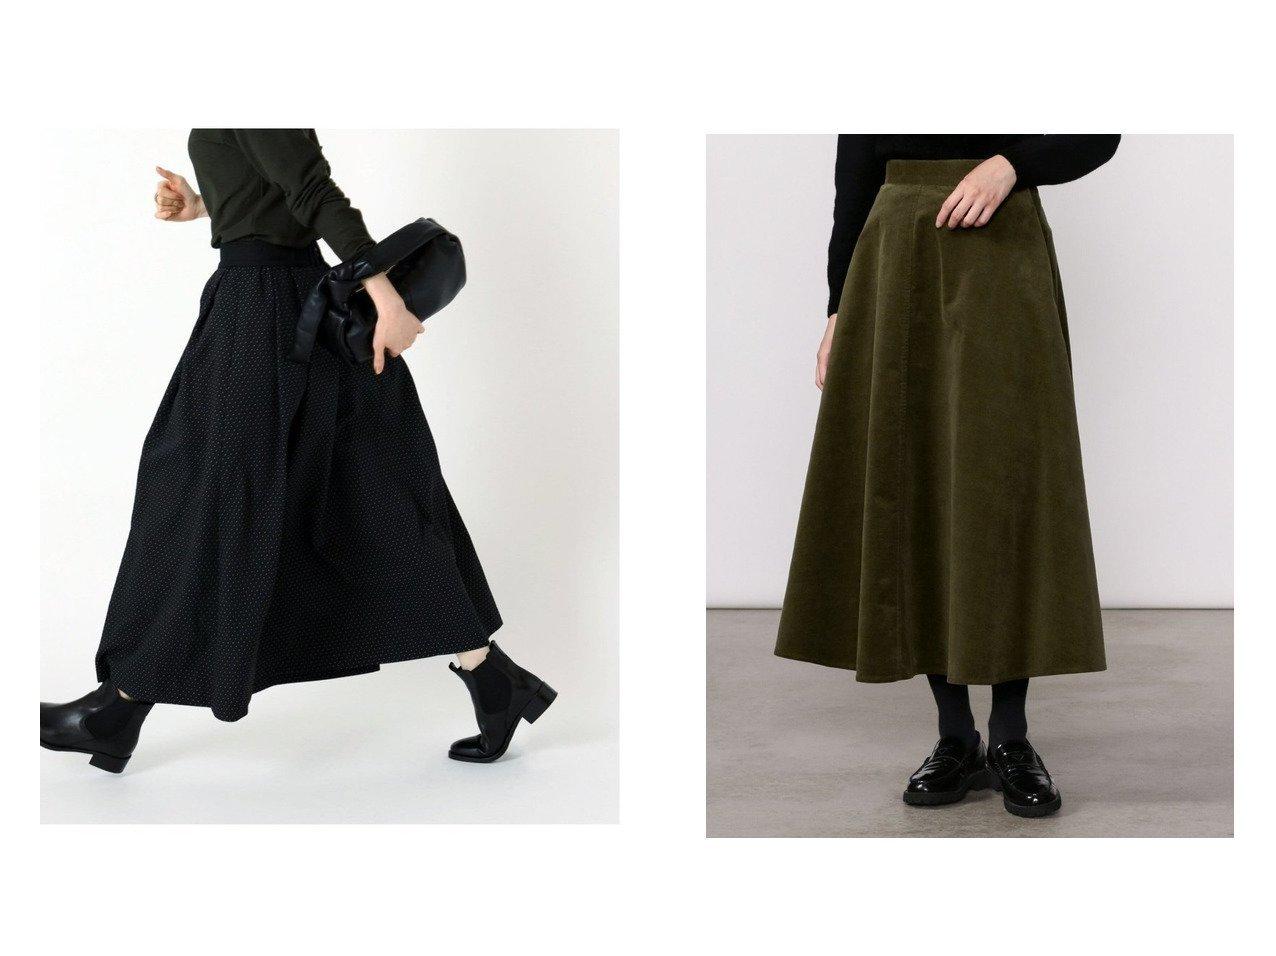 【Bshop/ビショップ】の【Gymphlex】コーデュロイ フレアスカート WOMEN&【IENA/イエナ】のDOT ジャガードタックスカート 【スカート】おすすめ!人気、トレンド・レディースファッションの通販 おすすめで人気の流行・トレンド、ファッションの通販商品 インテリア・家具・メンズファッション・キッズファッション・レディースファッション・服の通販 founy(ファニー) https://founy.com/ ファッション Fashion レディースファッション WOMEN スカート Skirt ロングスカート Long Skirt Aライン/フレアスカート Flared A-Line Skirts NEW・新作・新着・新入荷 New Arrivals 2021年 2021 2021-2022秋冬・A/W AW・Autumn/Winter・FW・Fall-Winter・2021-2022 A/W・秋冬 AW・Autumn/Winter・FW・Fall-Winter ギャザー ドット ロング 無地 コーデュロイ ストレッチ フレア ミモレ  ID:crp329100000070577